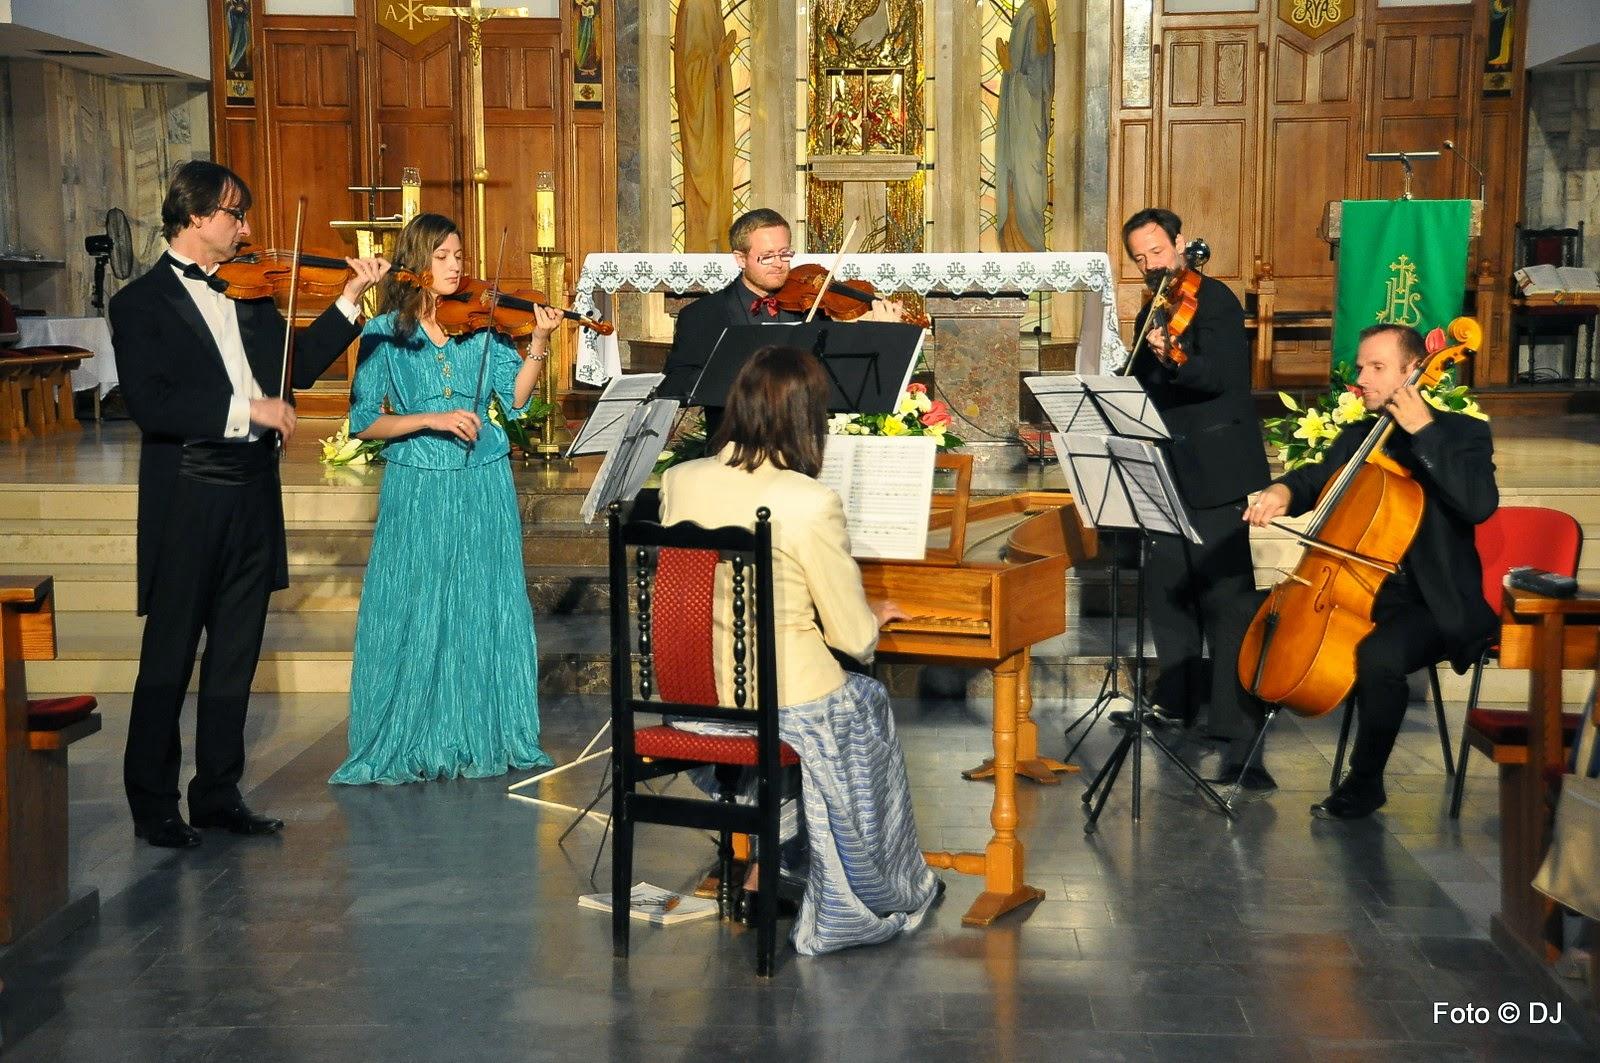 XVIII Festiwal Organowy Lublin Czuby - Koncert Antonio Vivaldi - Pory Roku